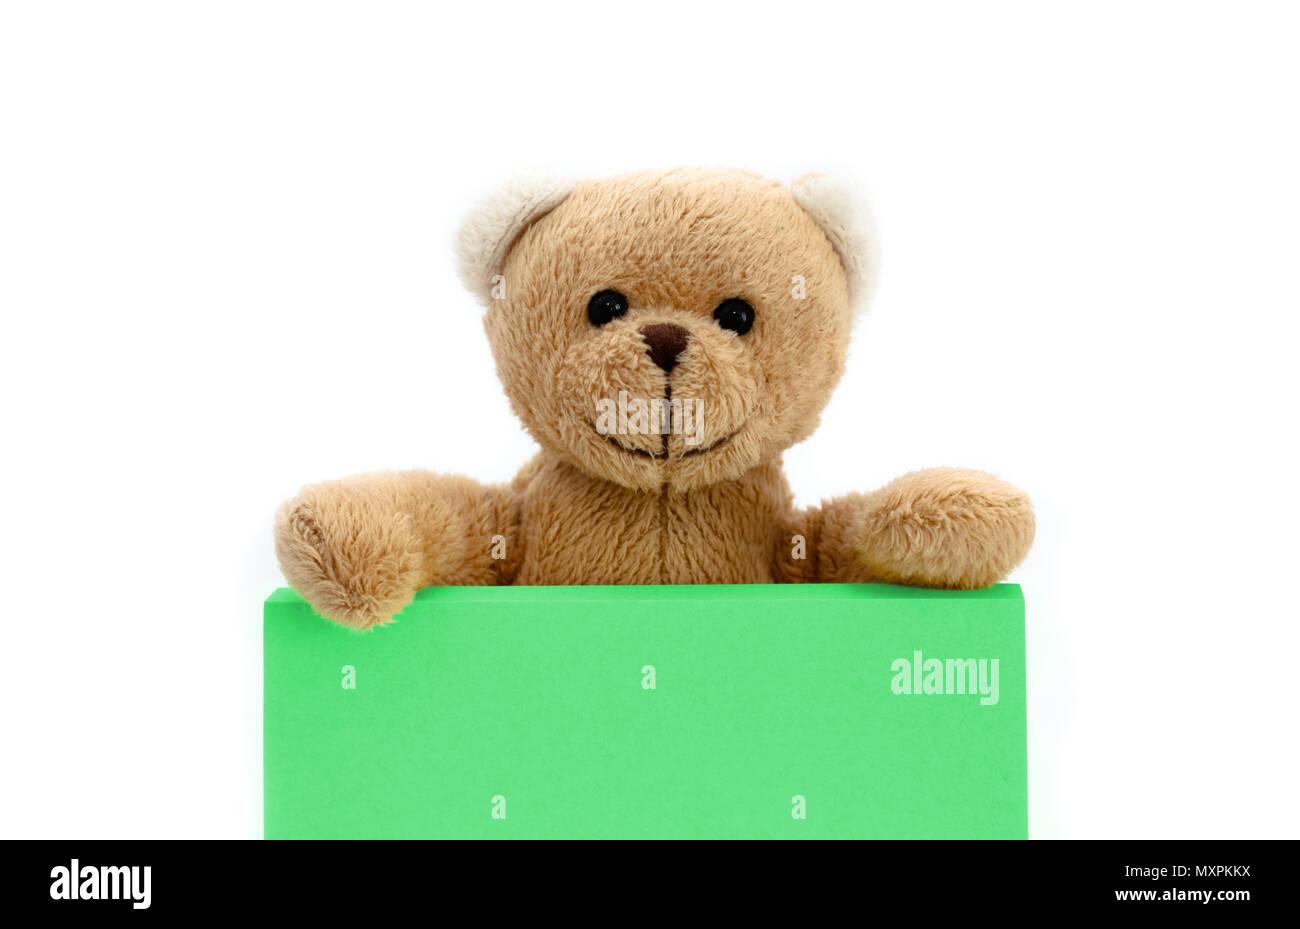 Bushy bear sergeant